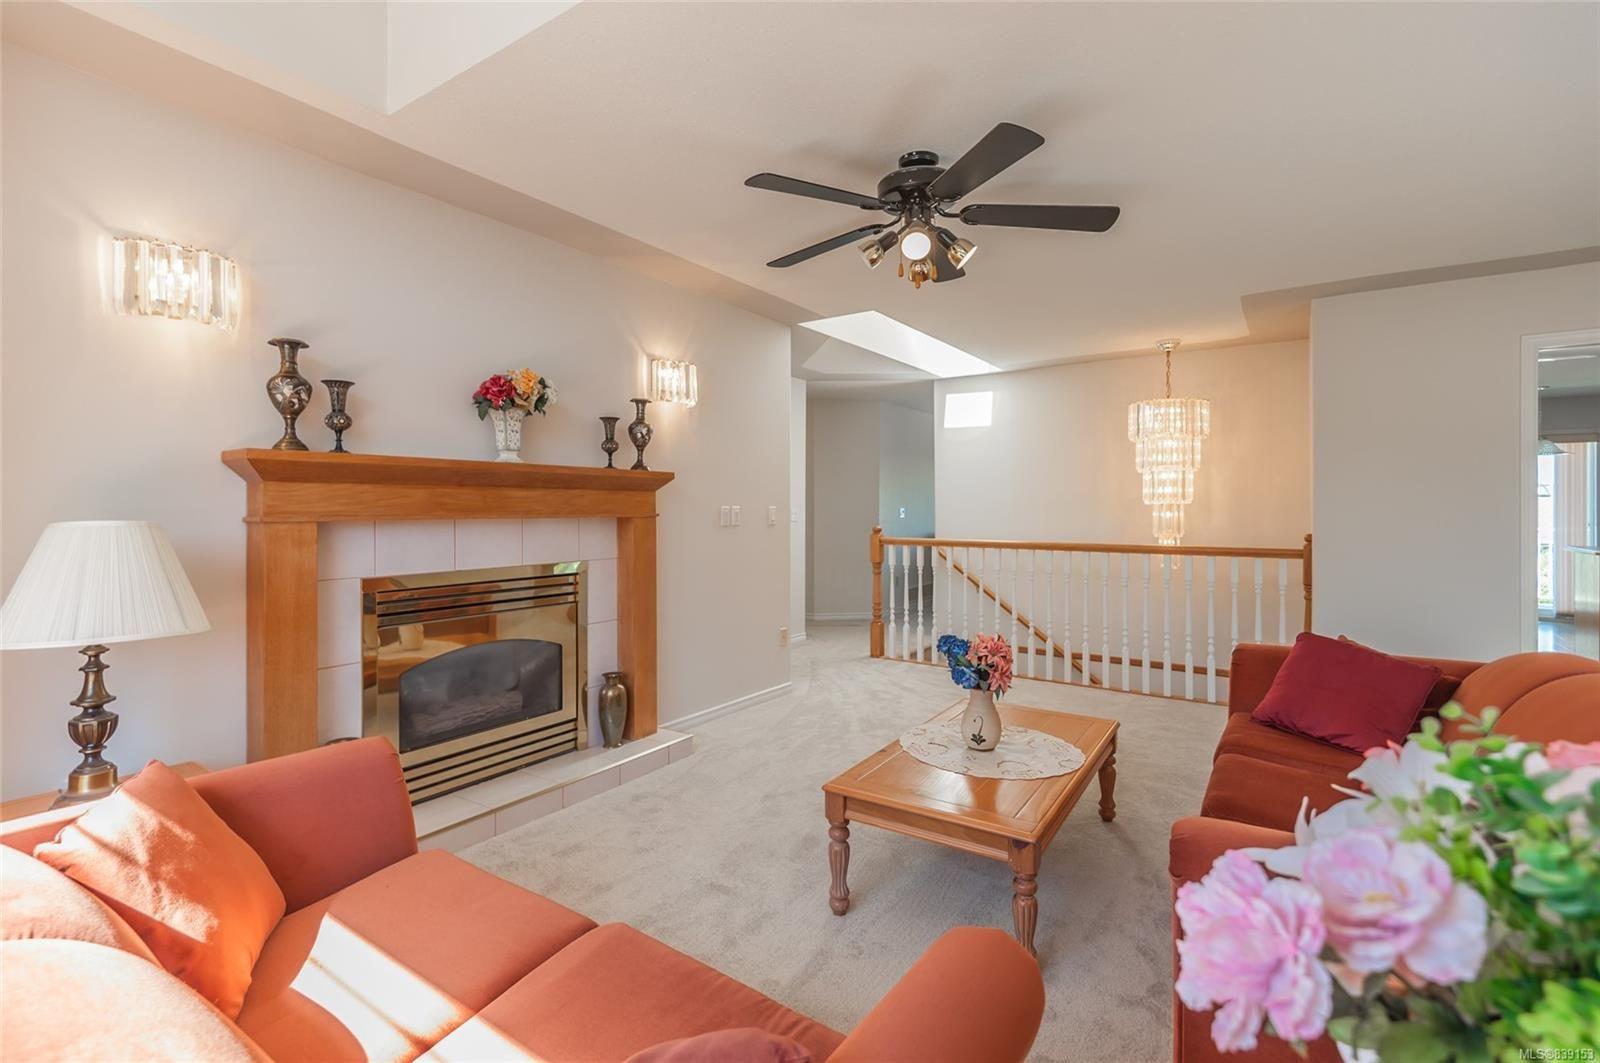 Photo 24: Photos: 6412 Dover Rd in NANAIMO: Na North Nanaimo House for sale (Nanaimo)  : MLS®# 839153